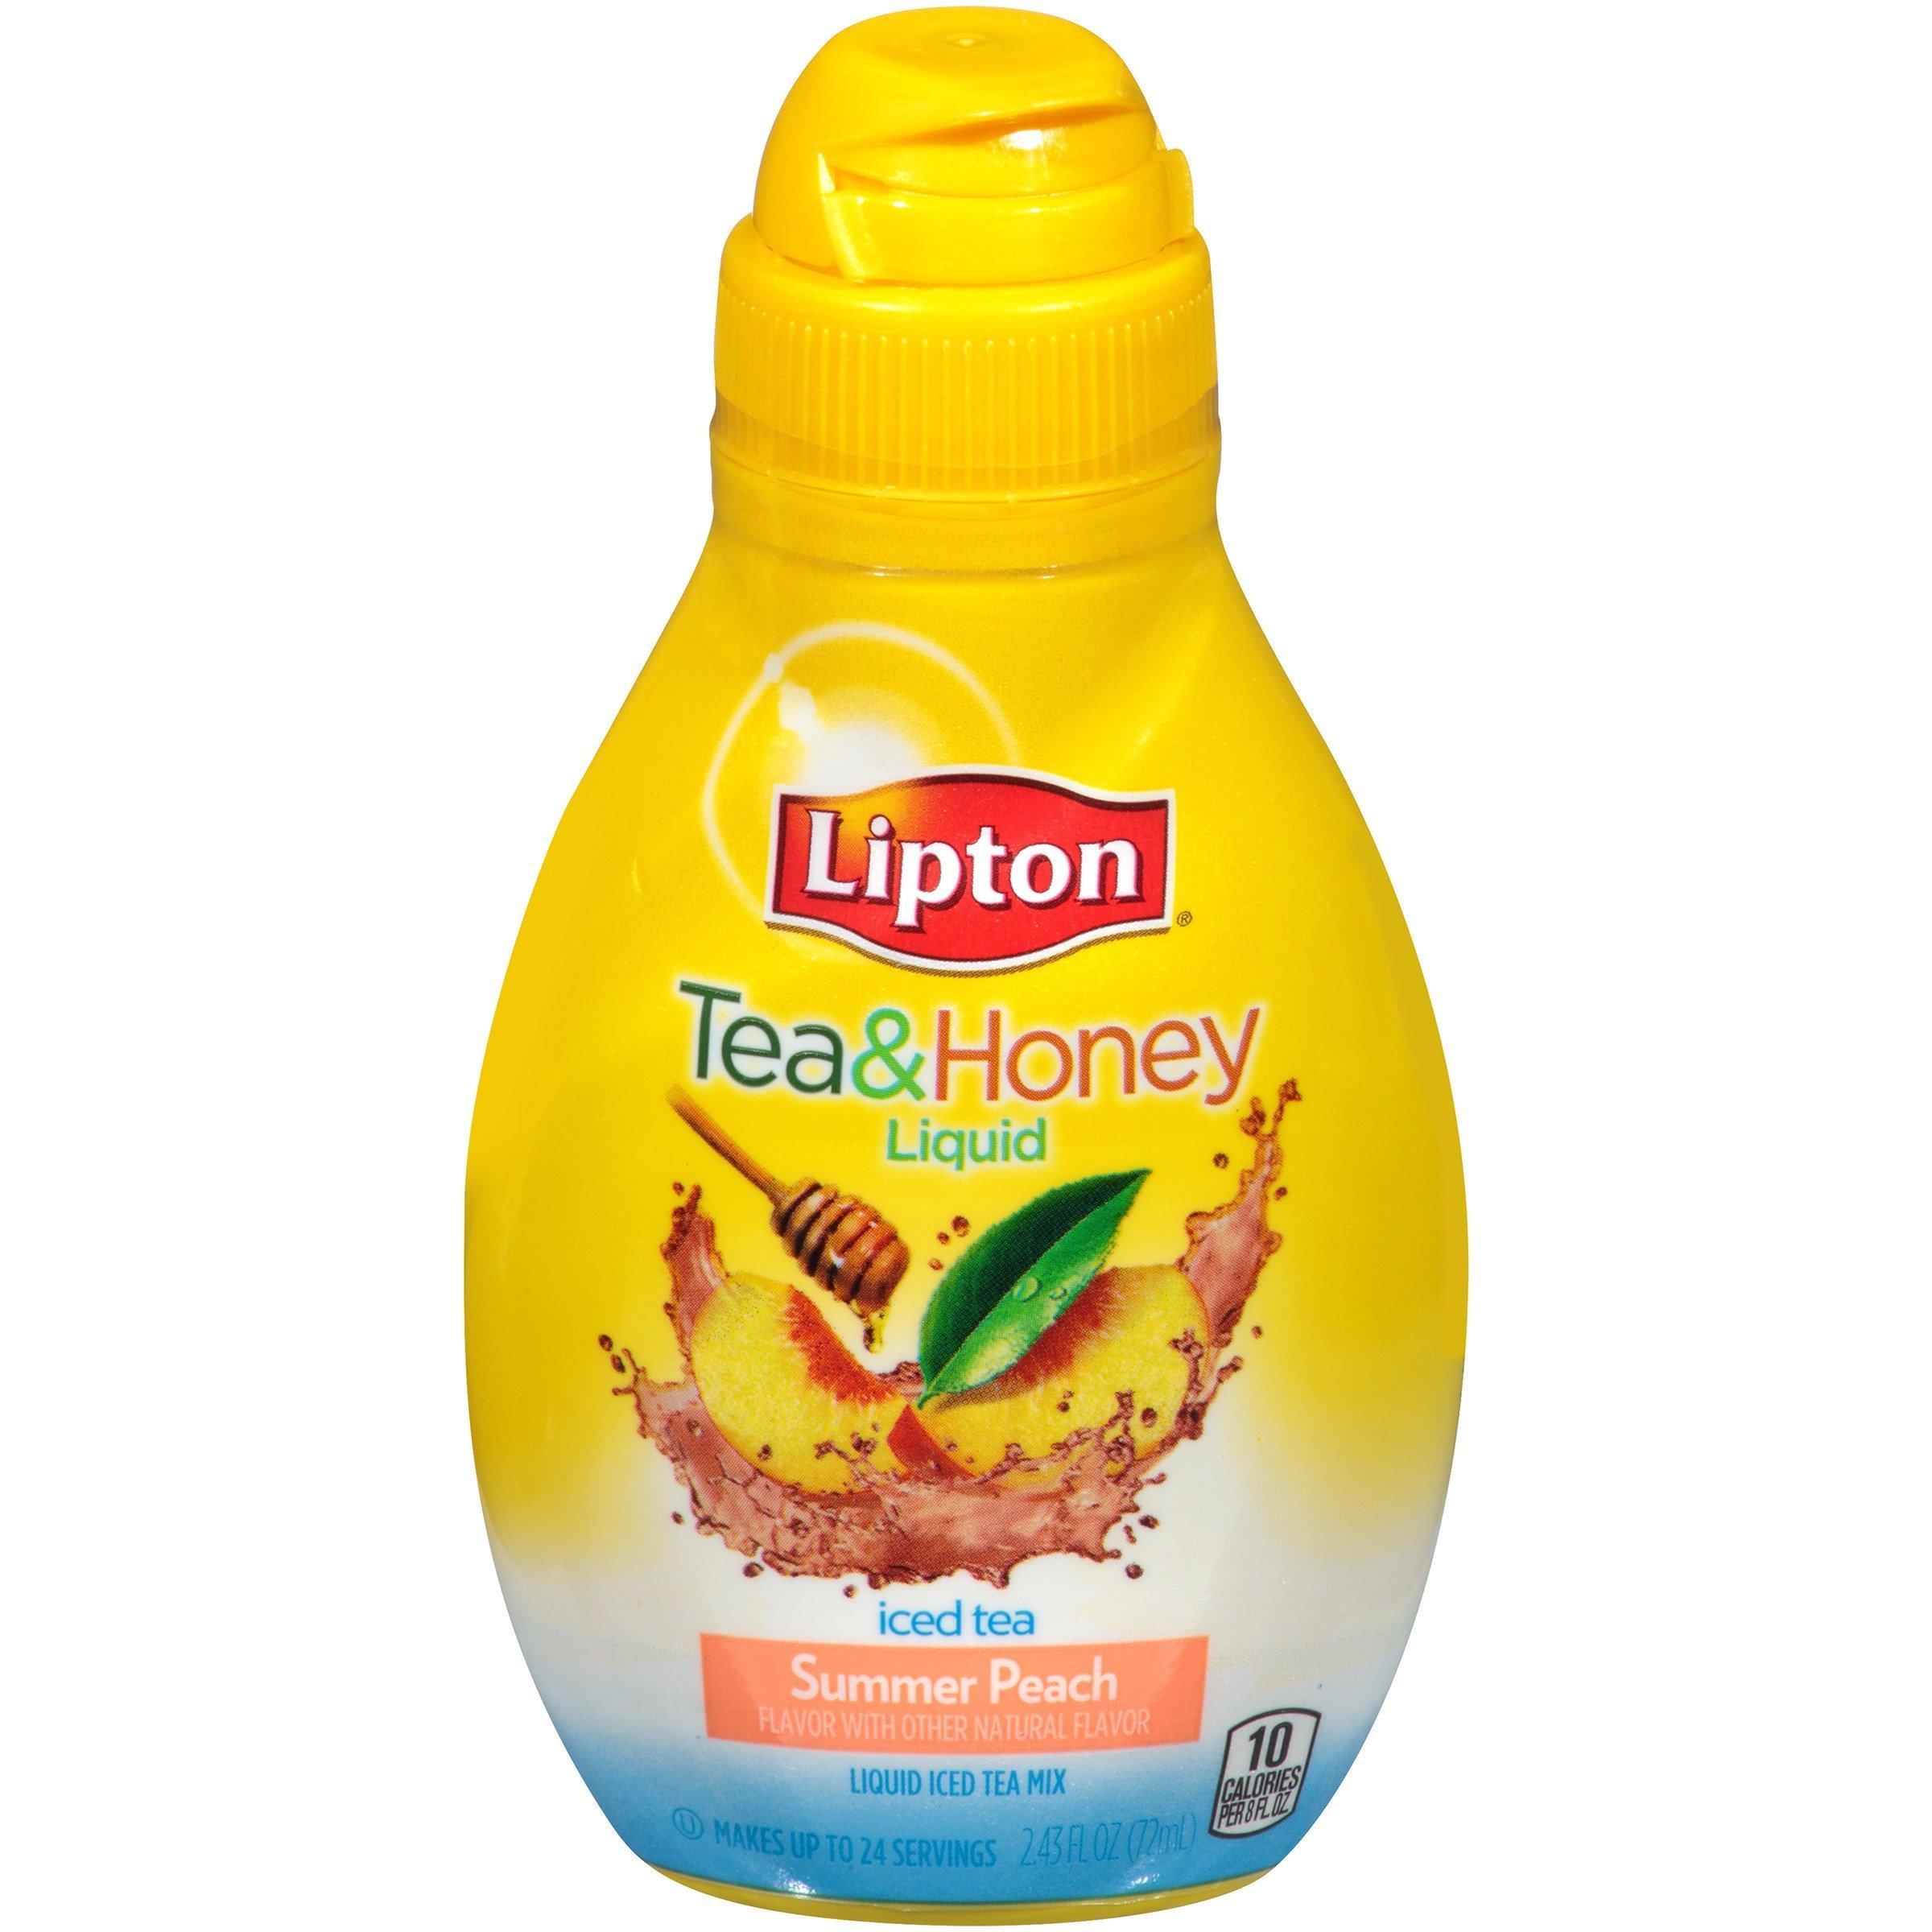 Lipton Summer Peach Liquid Iced Tea Mix, 2.43 Fluid Ounce - 8 per case.